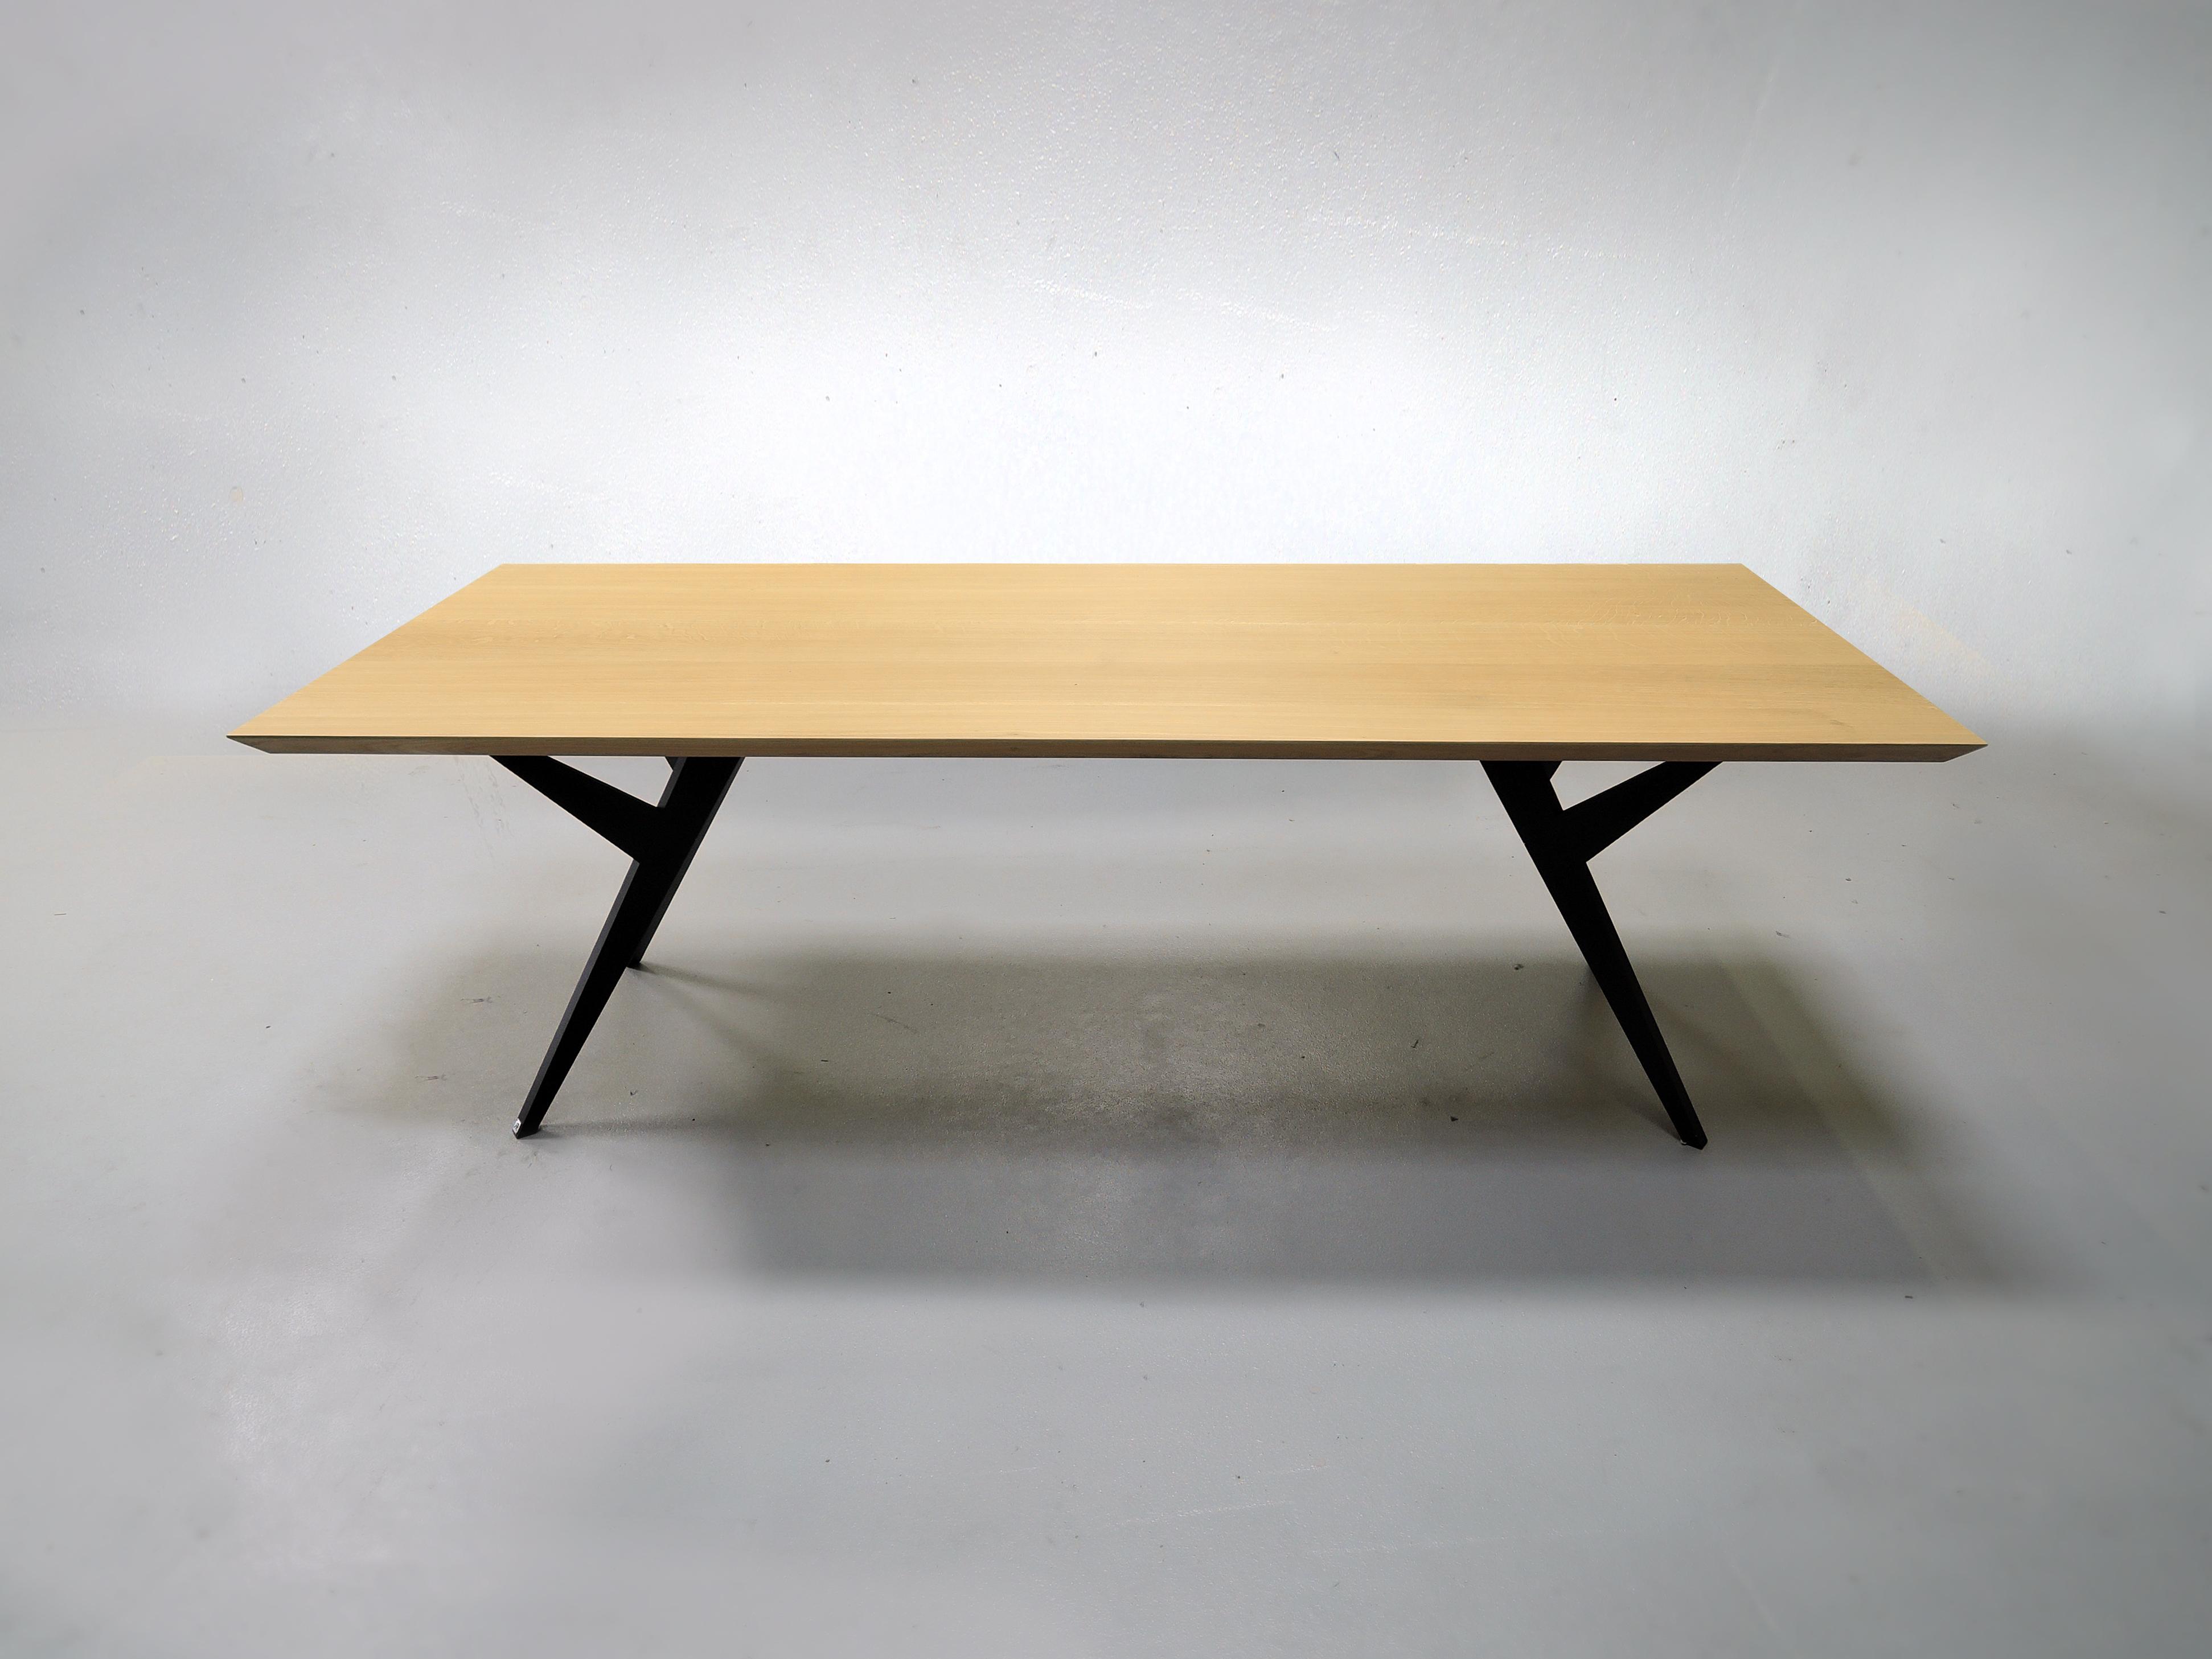 table ma reine m tal et bois massif design pur fabrication artisanale. Black Bedroom Furniture Sets. Home Design Ideas